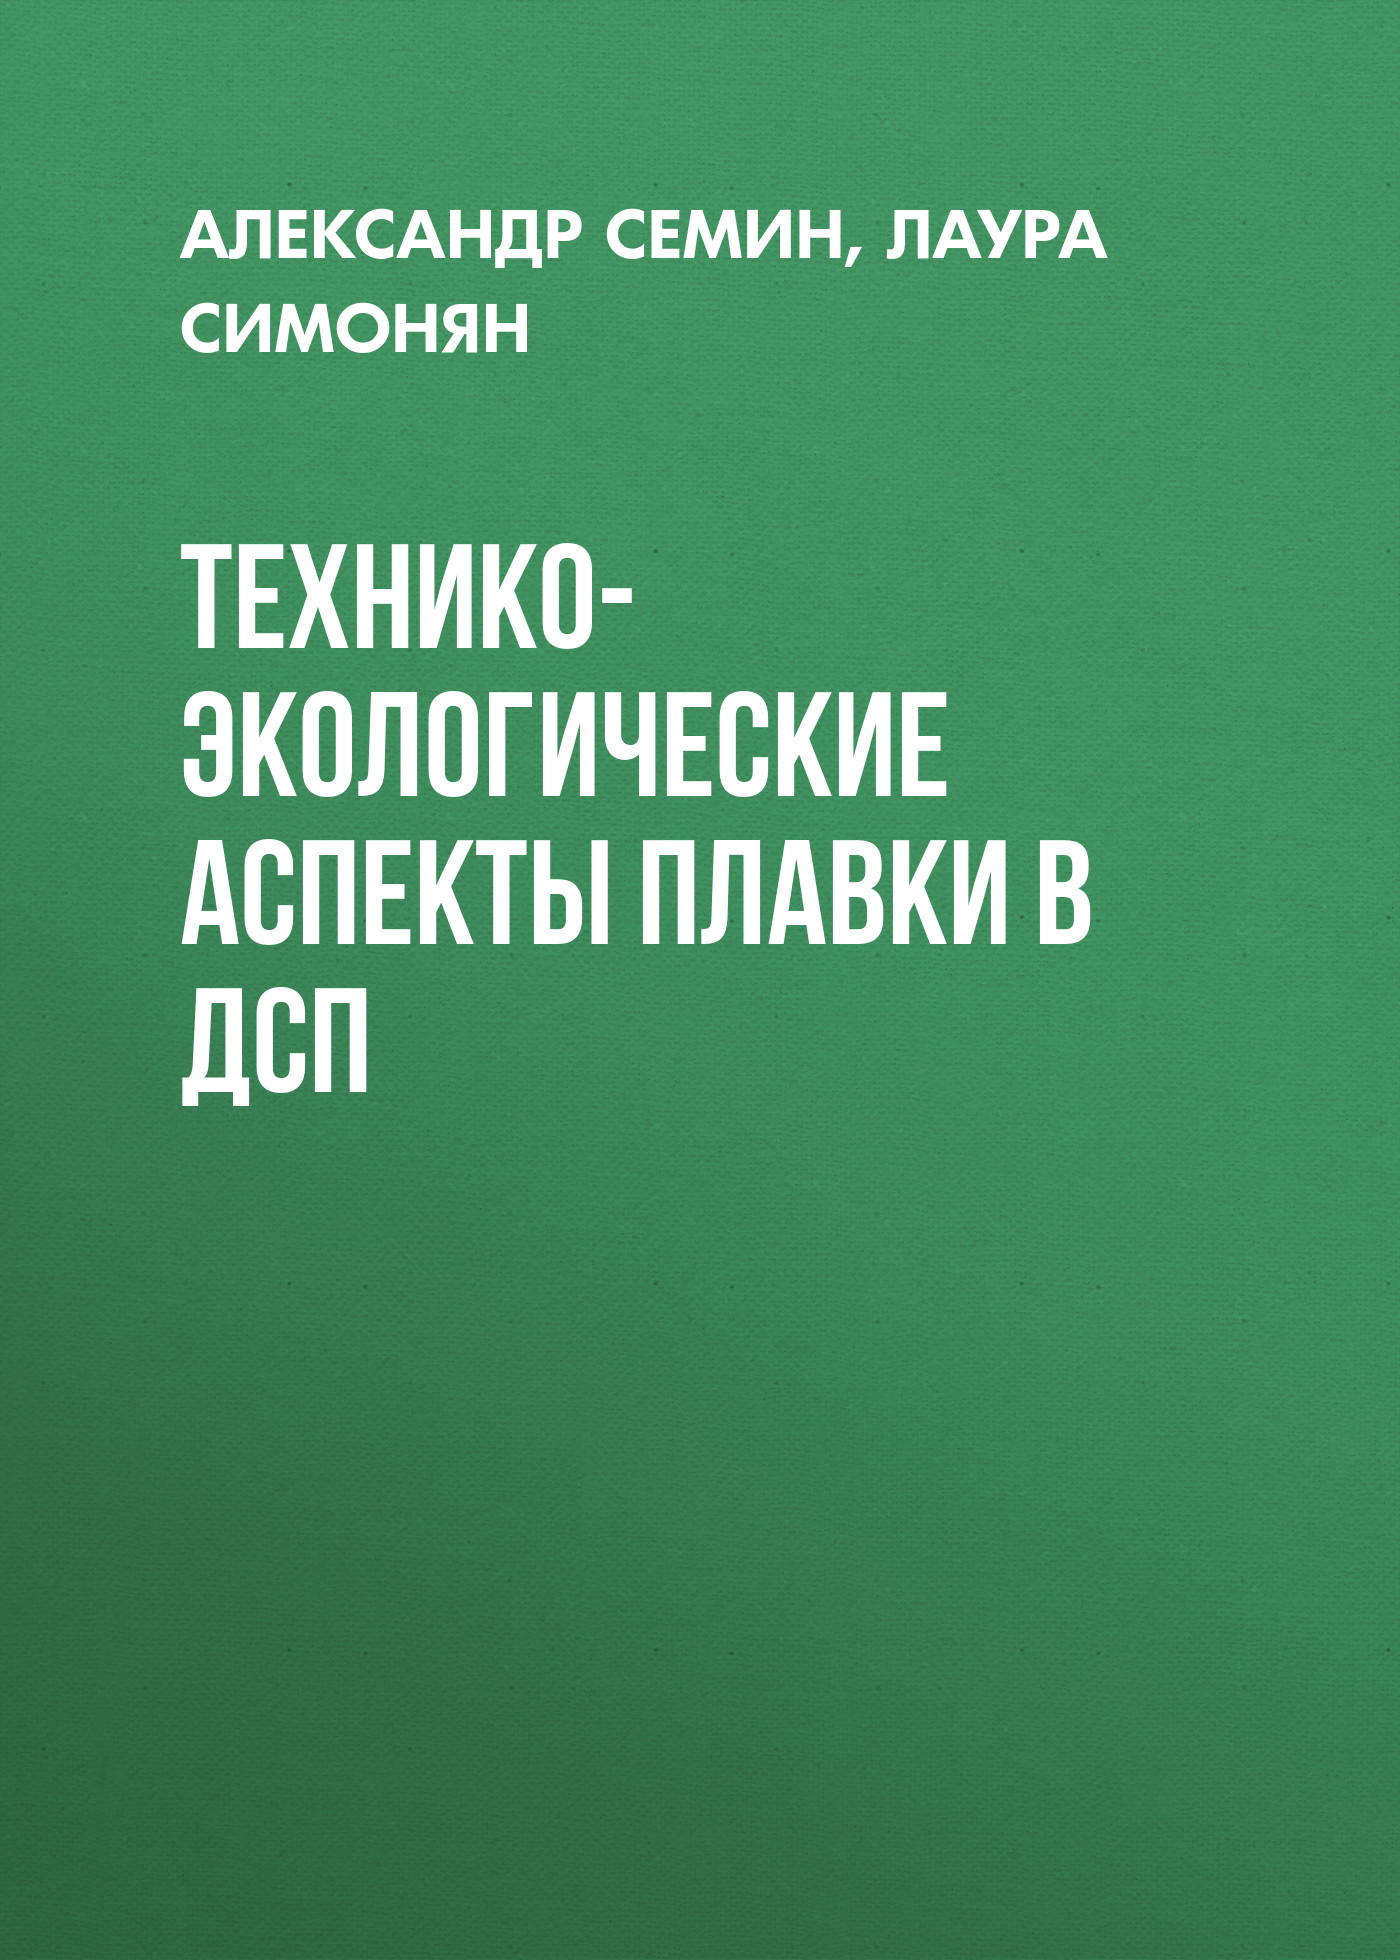 Лаура Симонян Технико-экологические аспекты плавки в ДСП